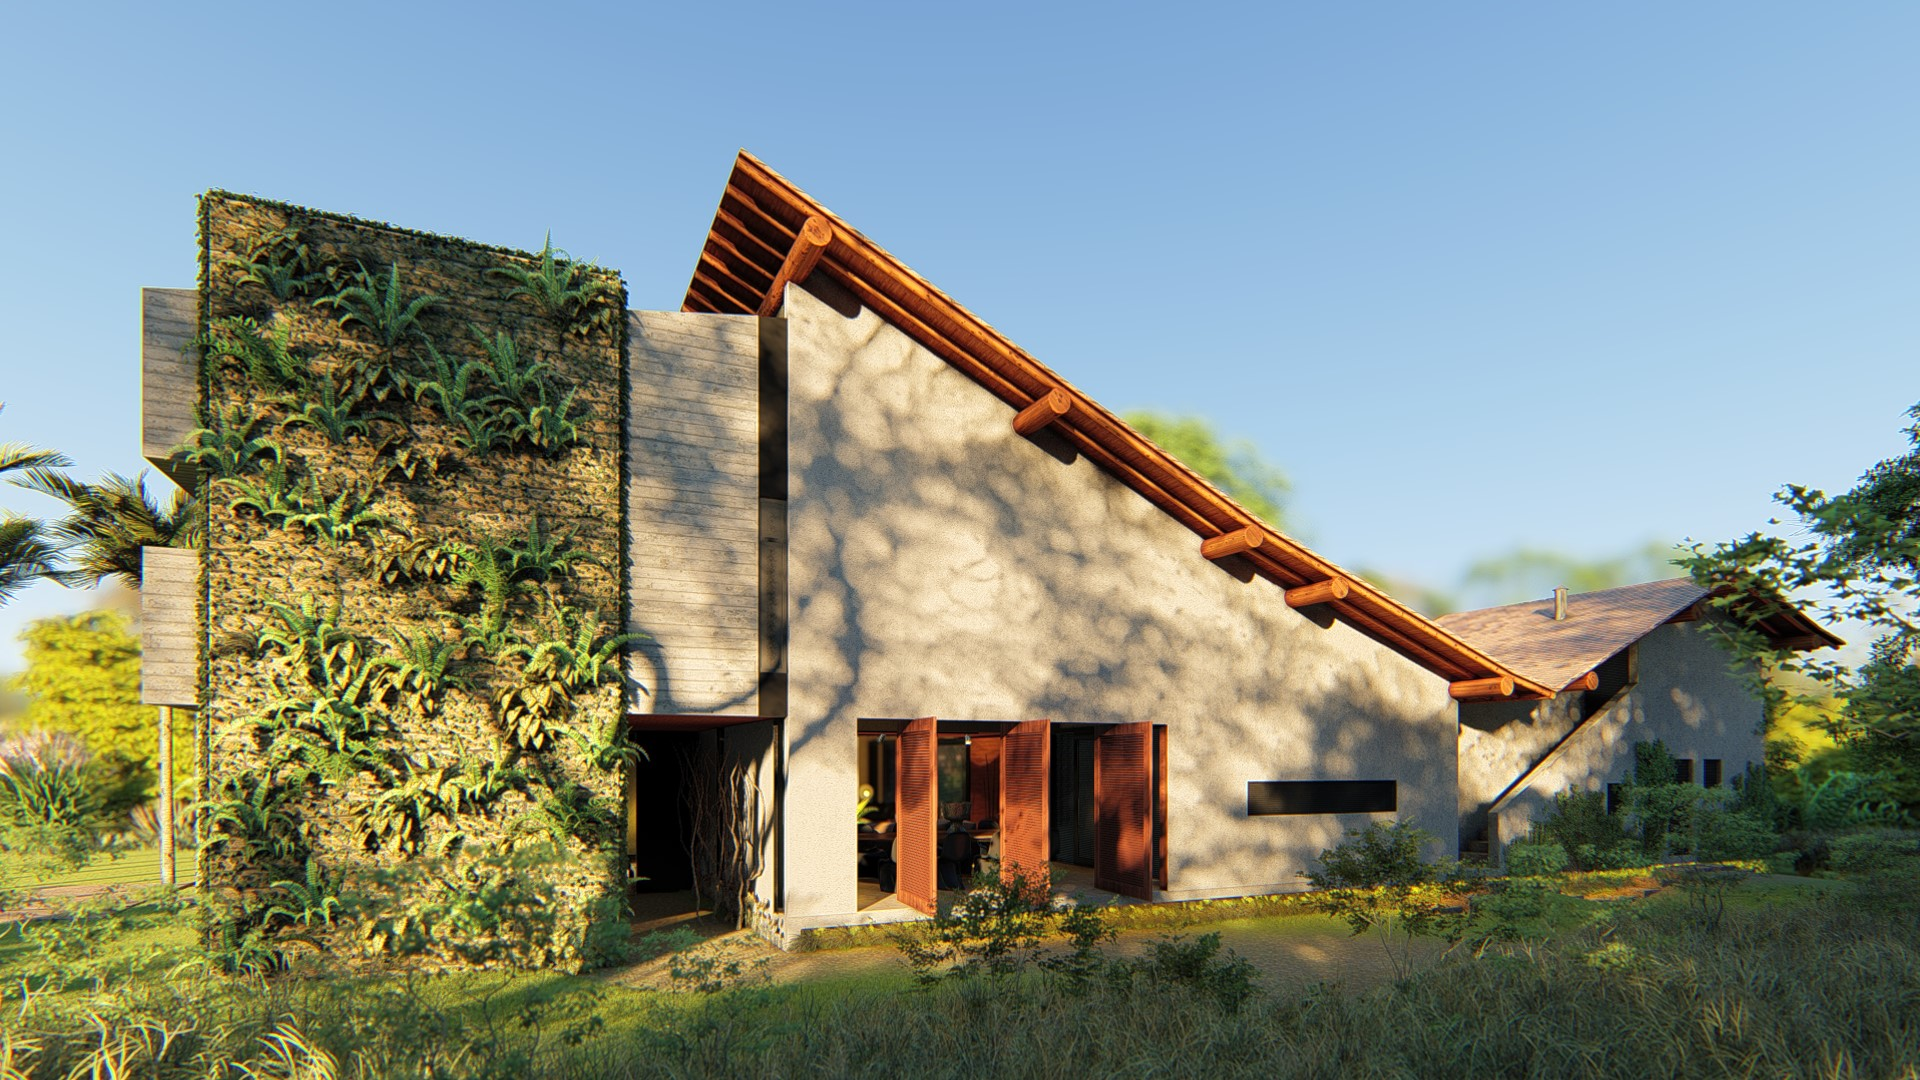 Fachada lateral com recortes de telhado